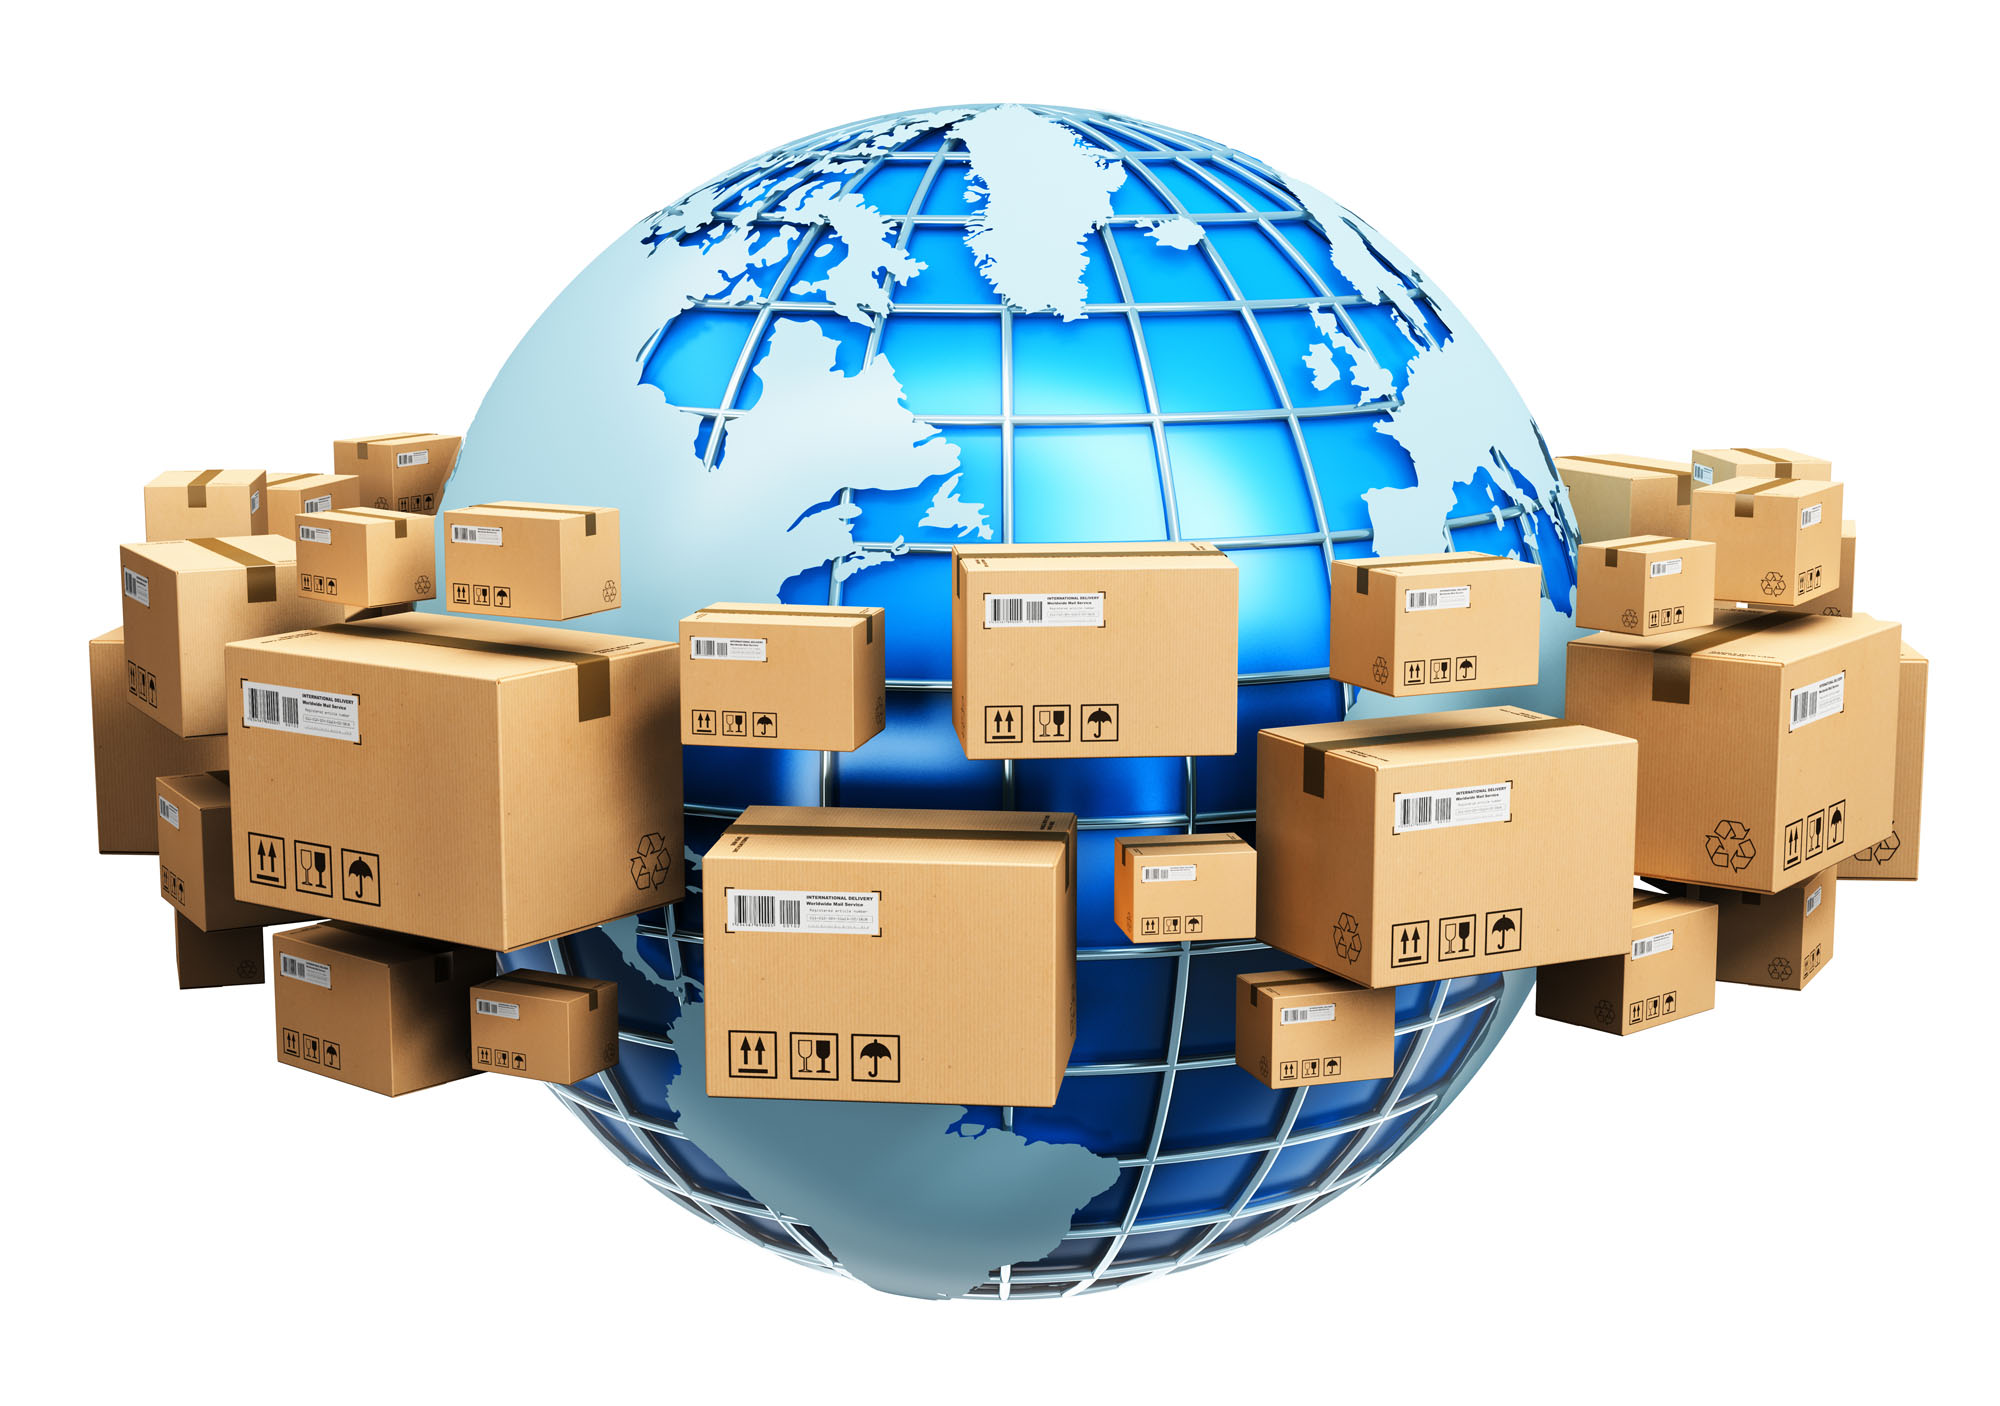 super health center shc brands international domestic distribution